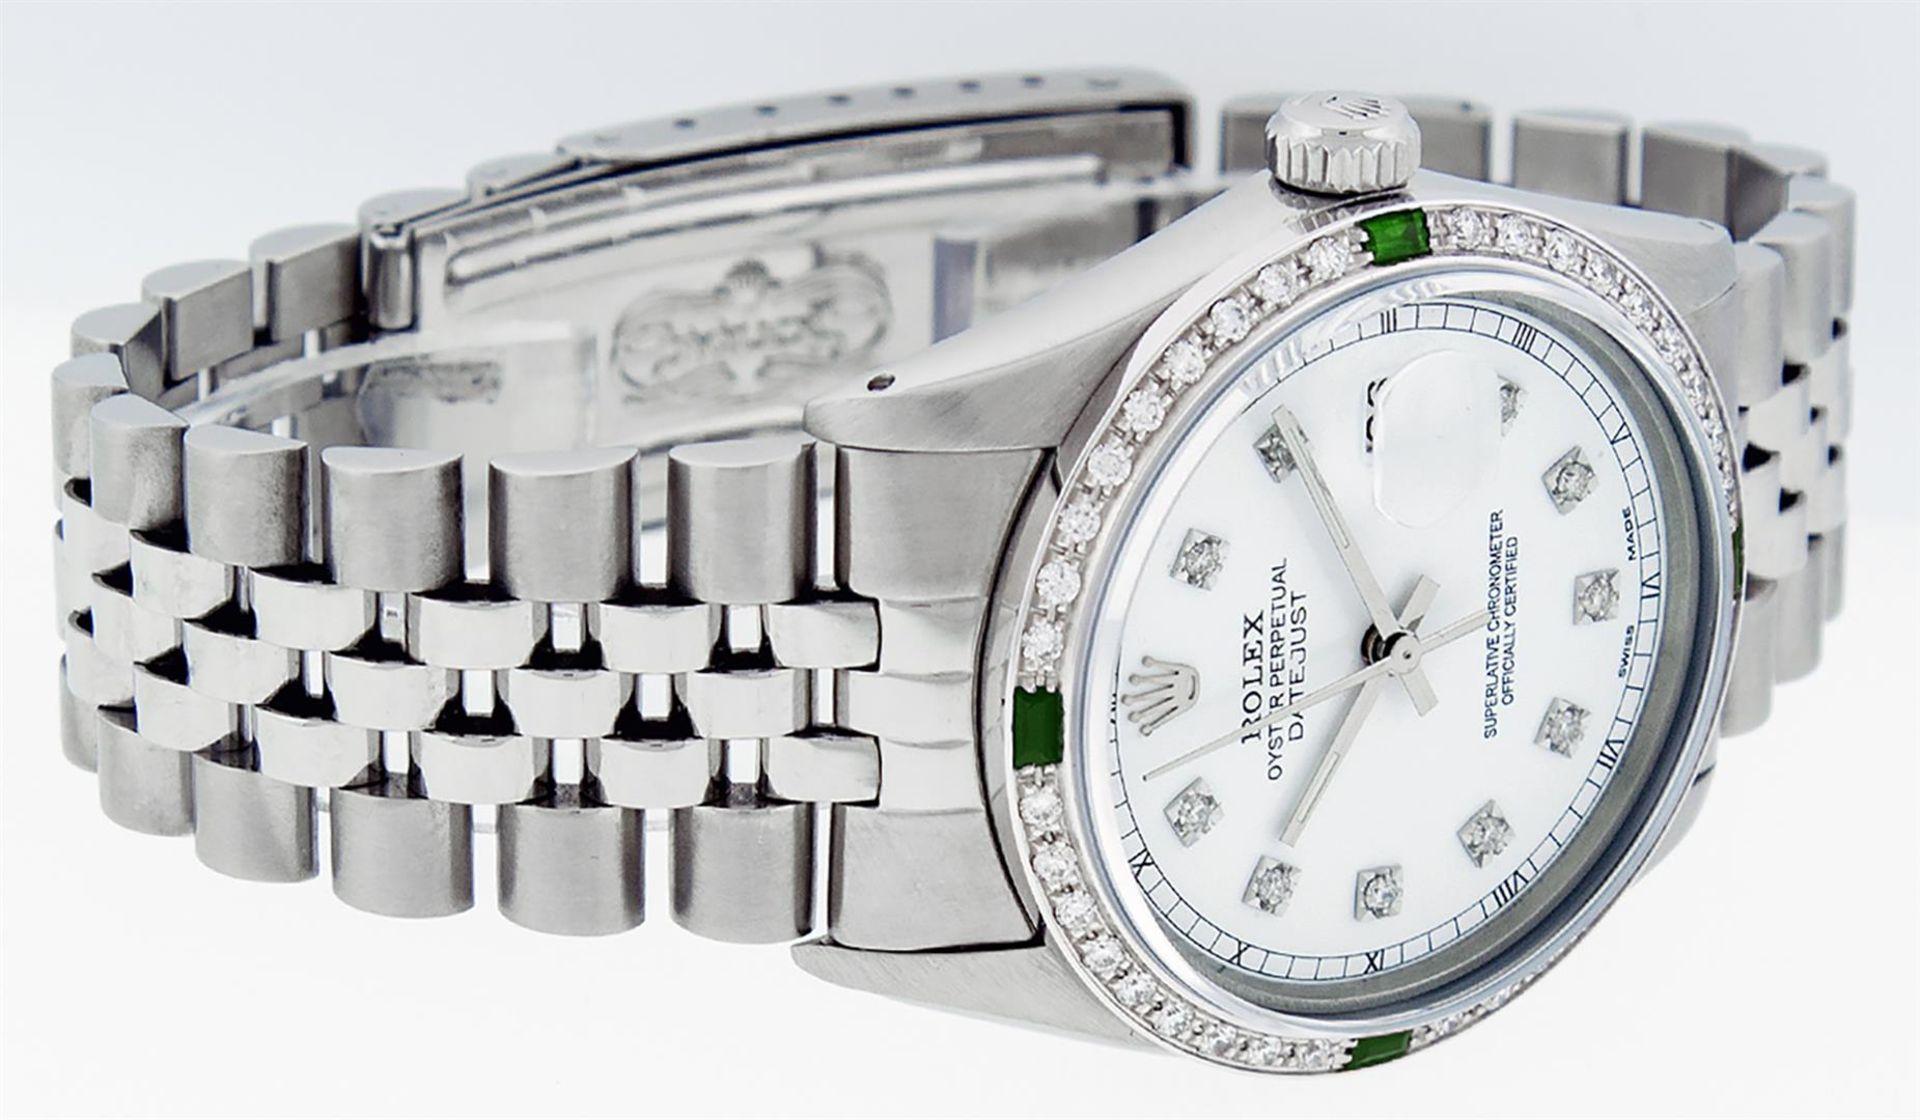 Rolex Mens Stainless Steel White Diamond & Emerald 36MM Datejust Wristwatch - Image 3 of 9